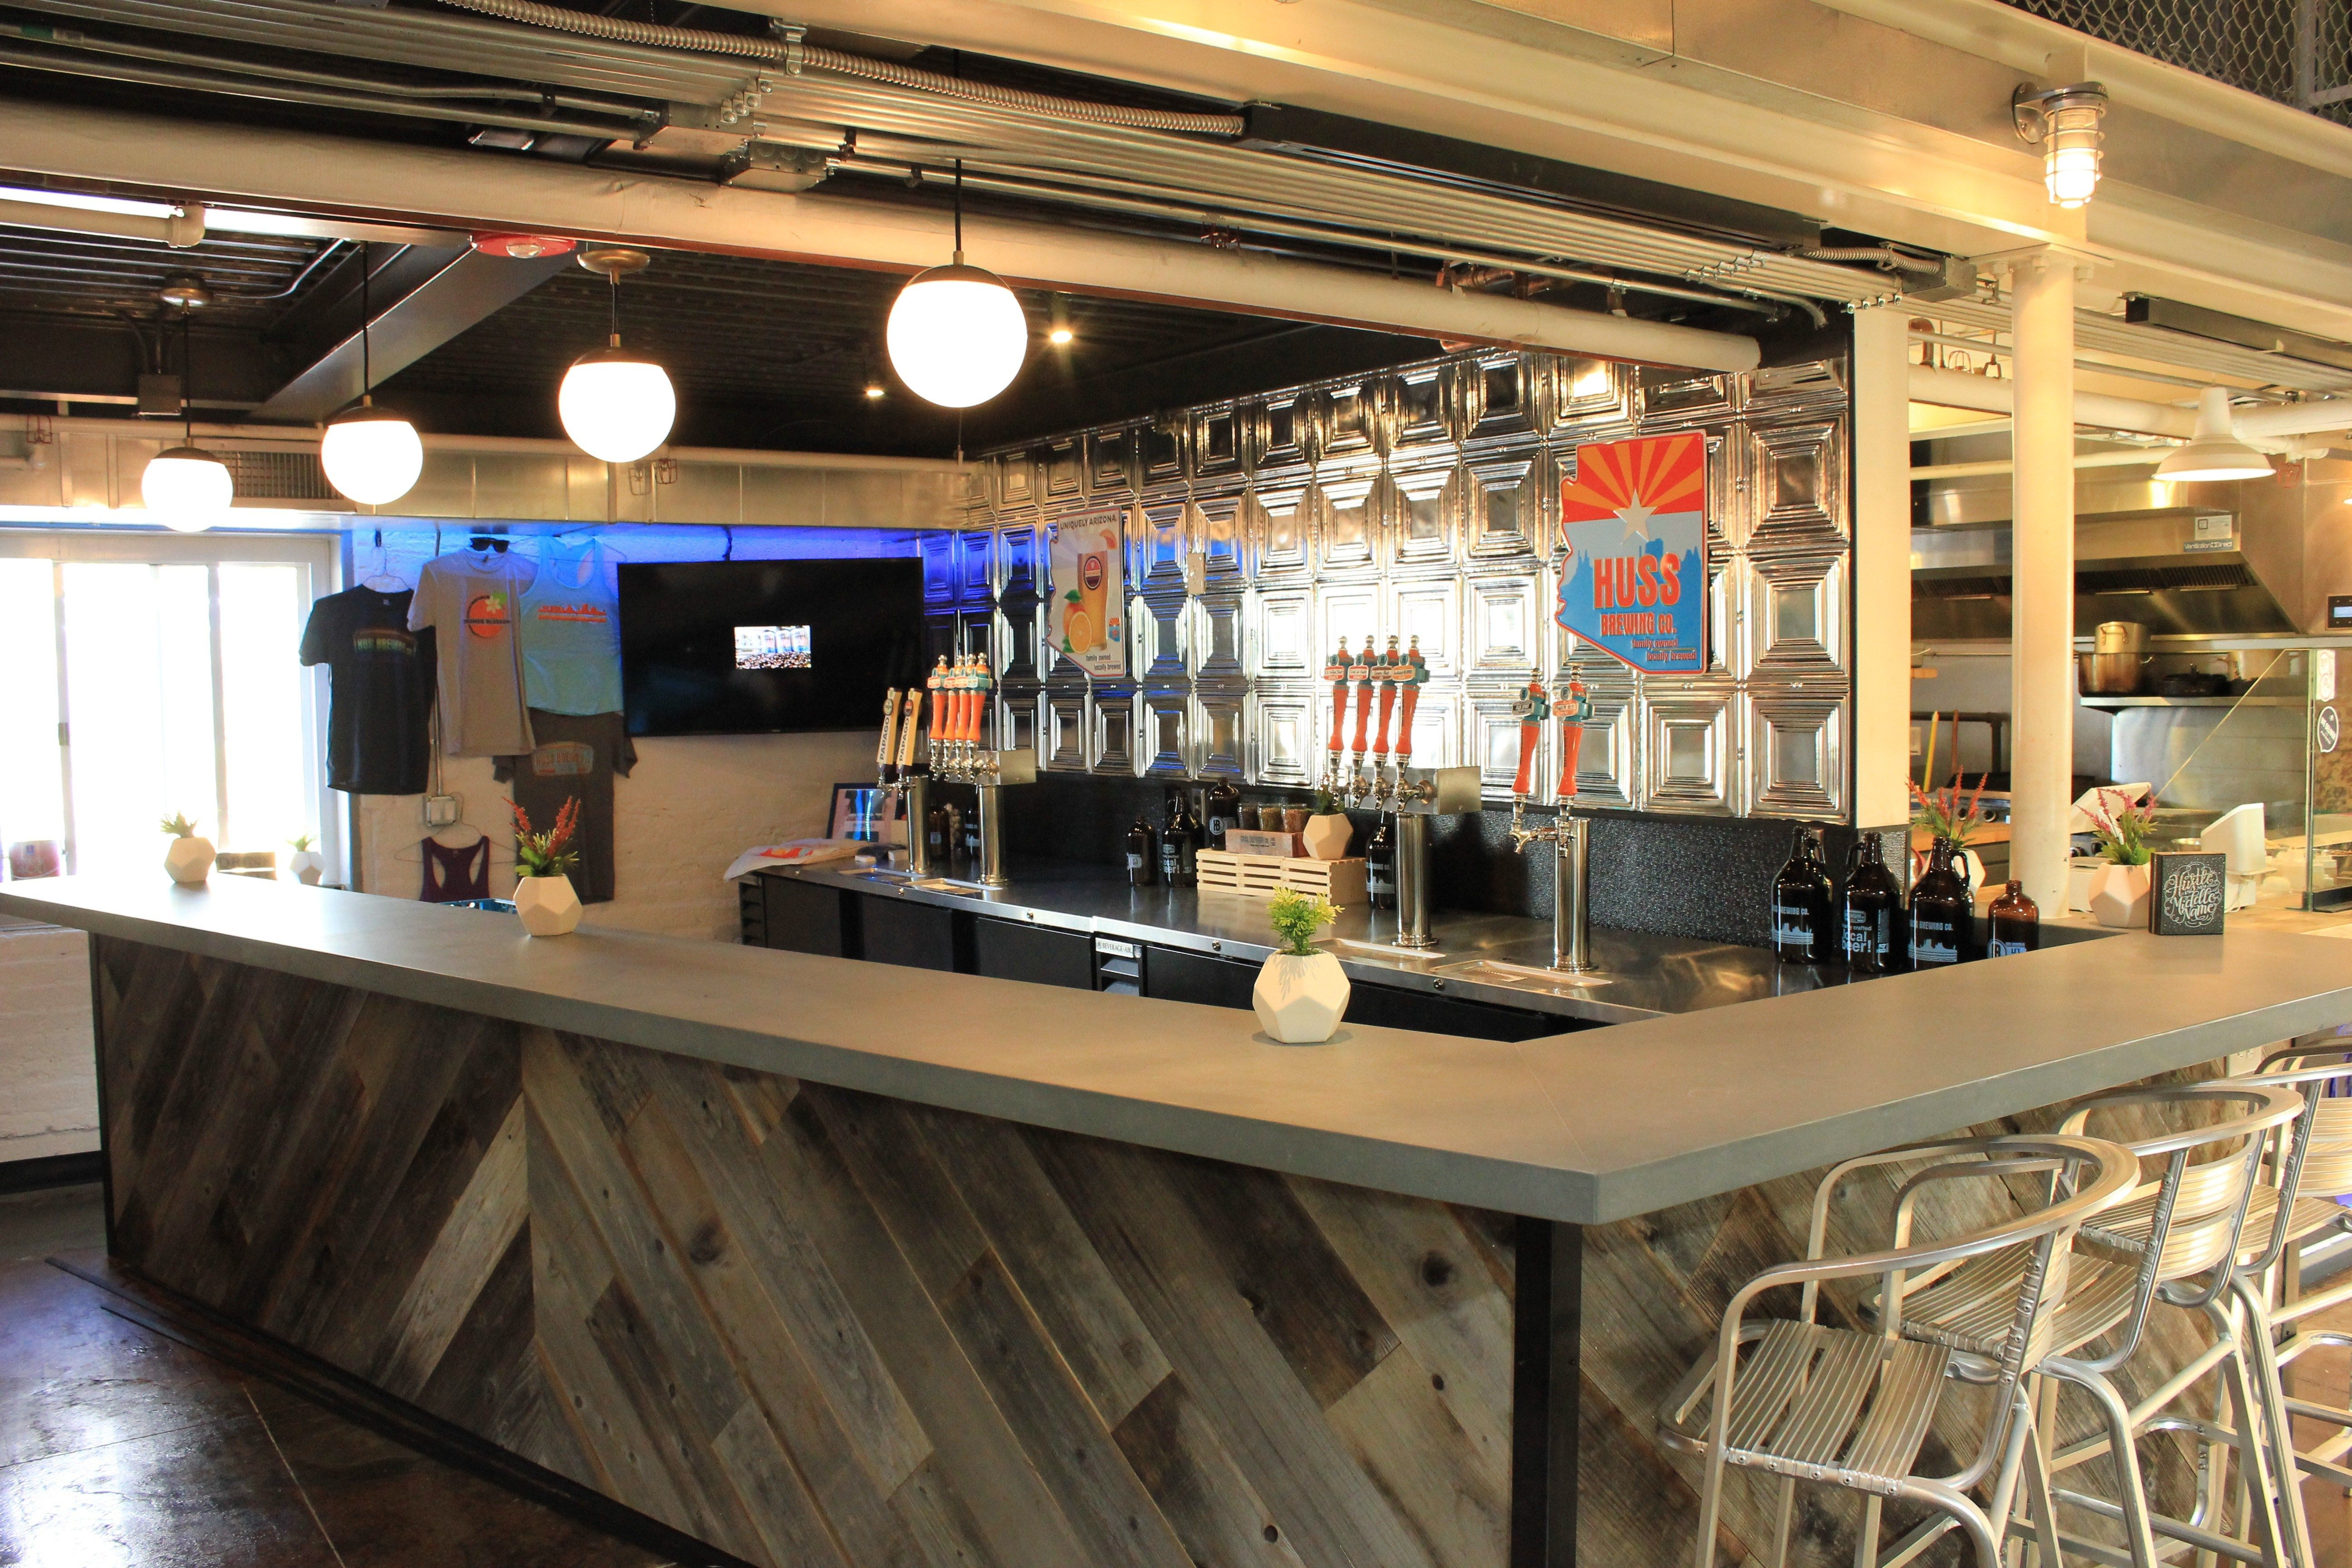 Desoto market in phoenix kicks off brewery popup series